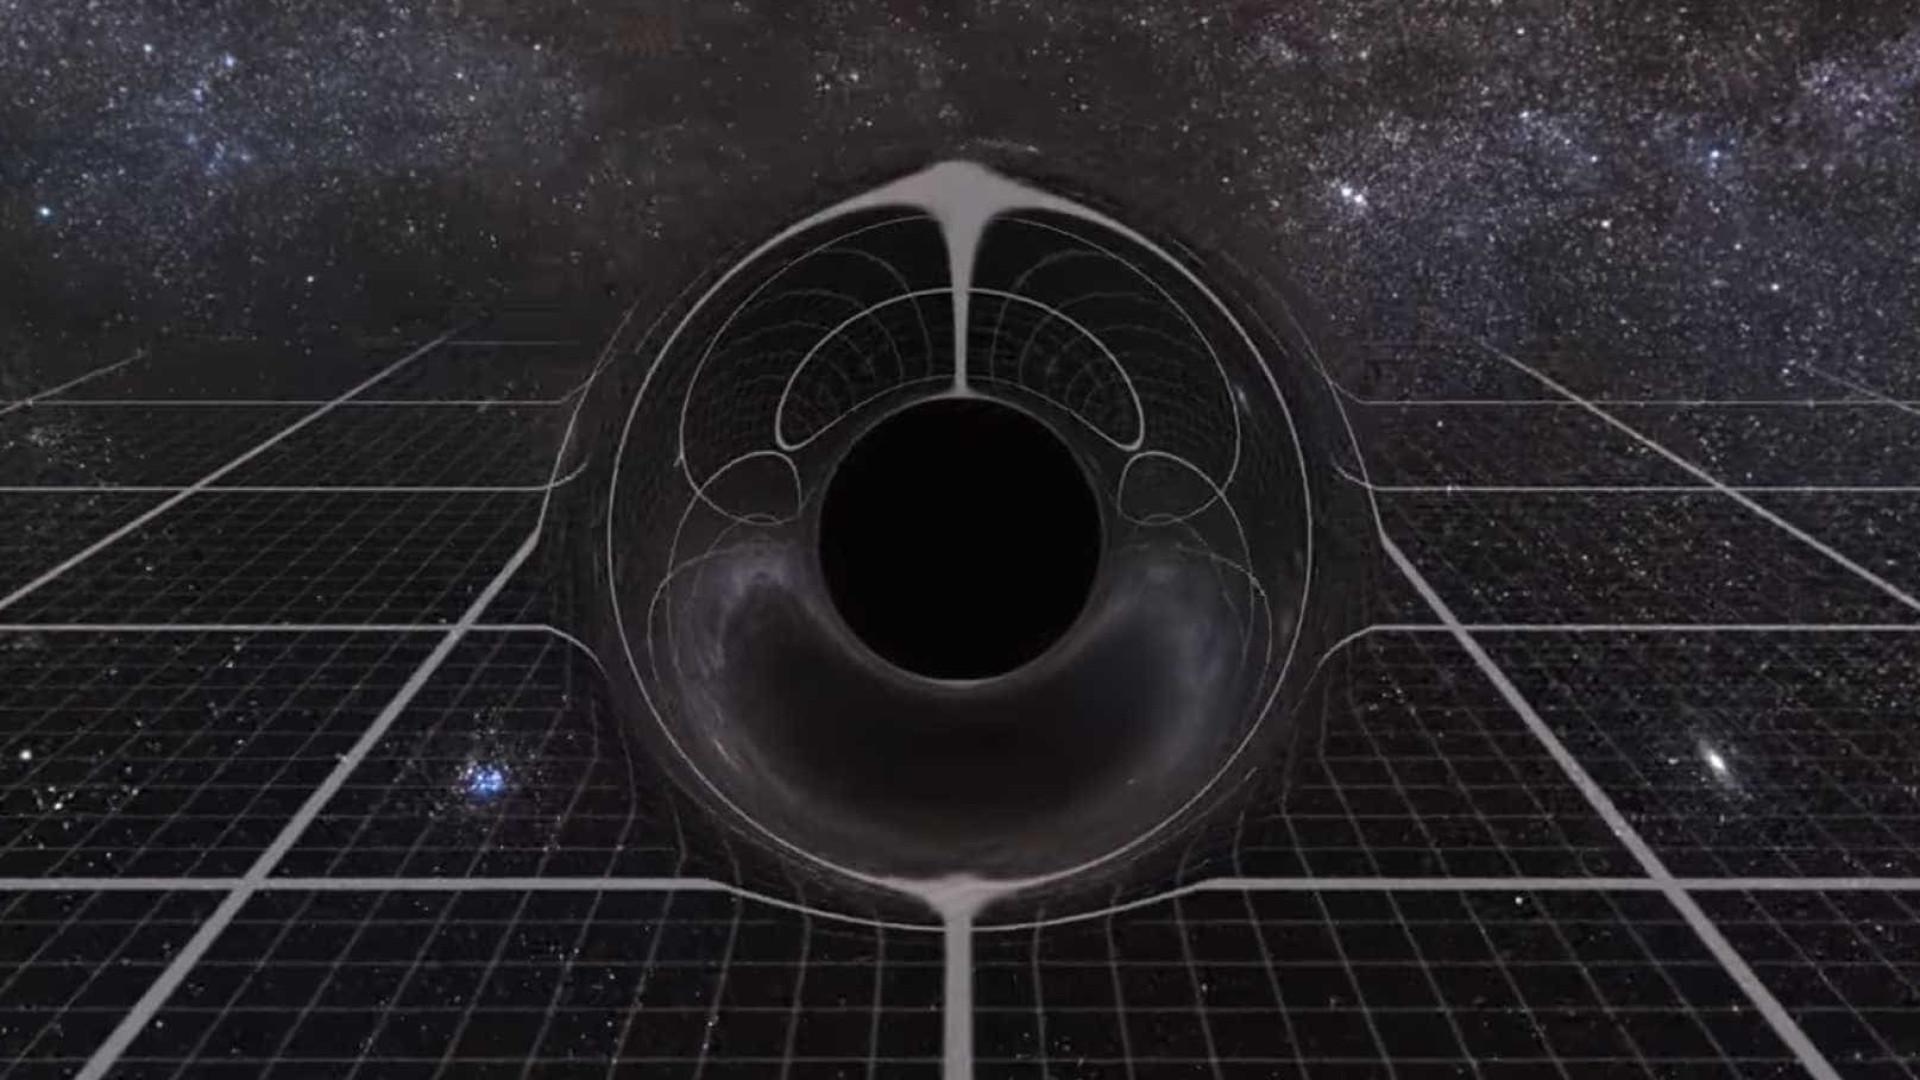 Vídeo te ajuda a compreender os buracos negros